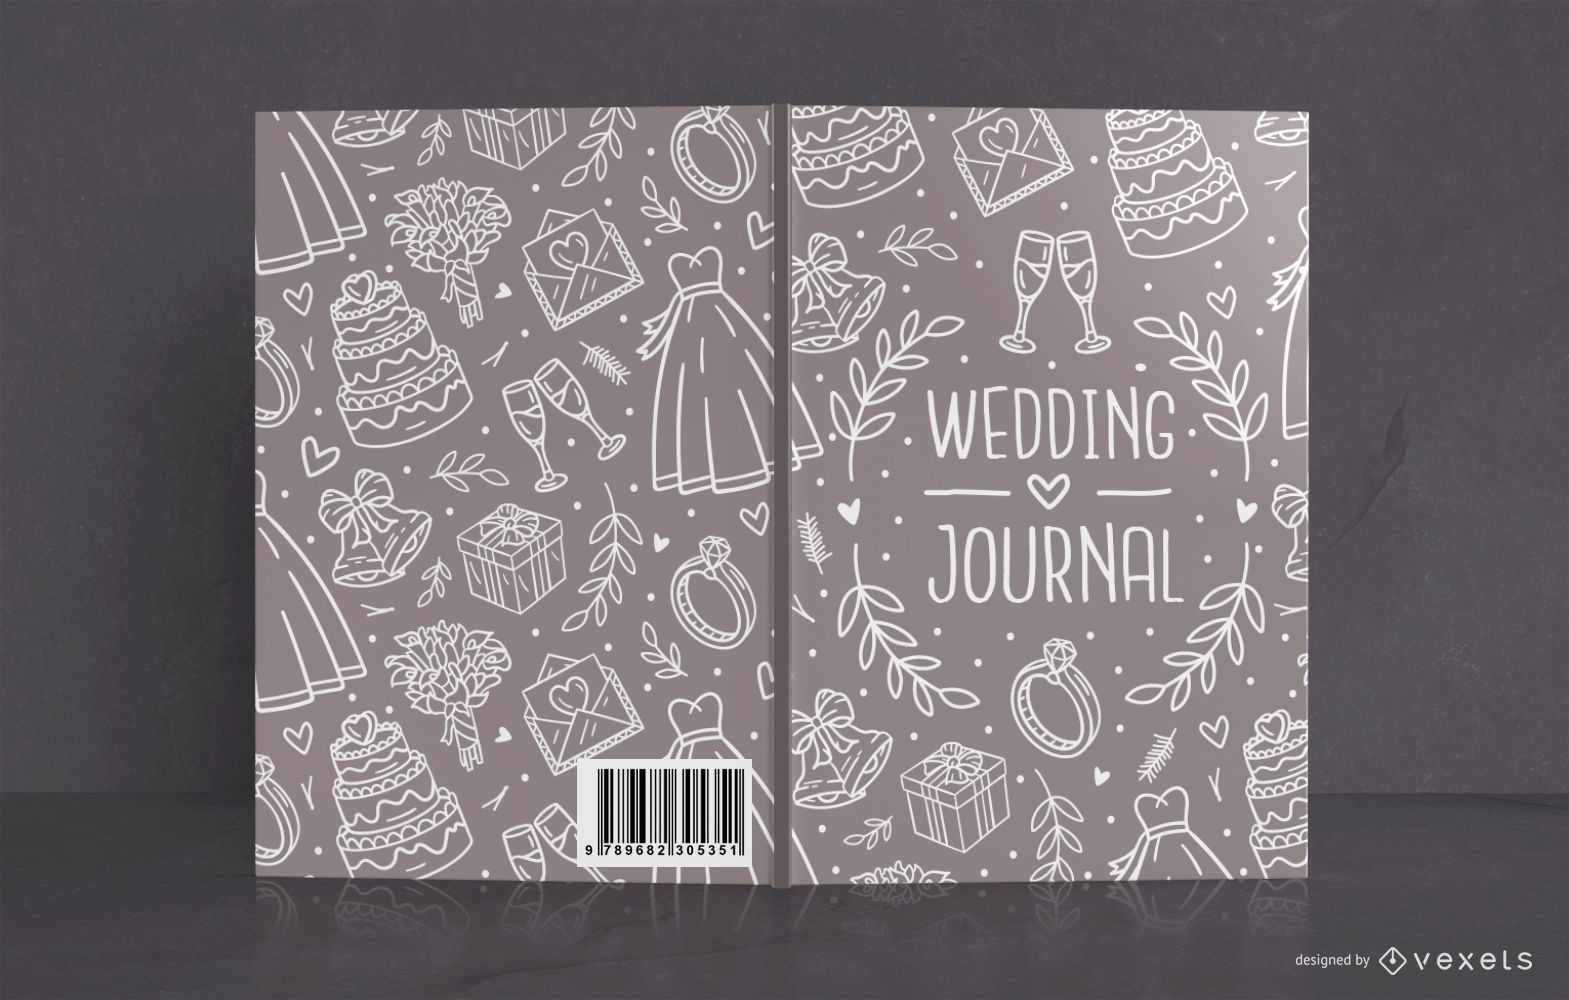 Wedding journal book cover design